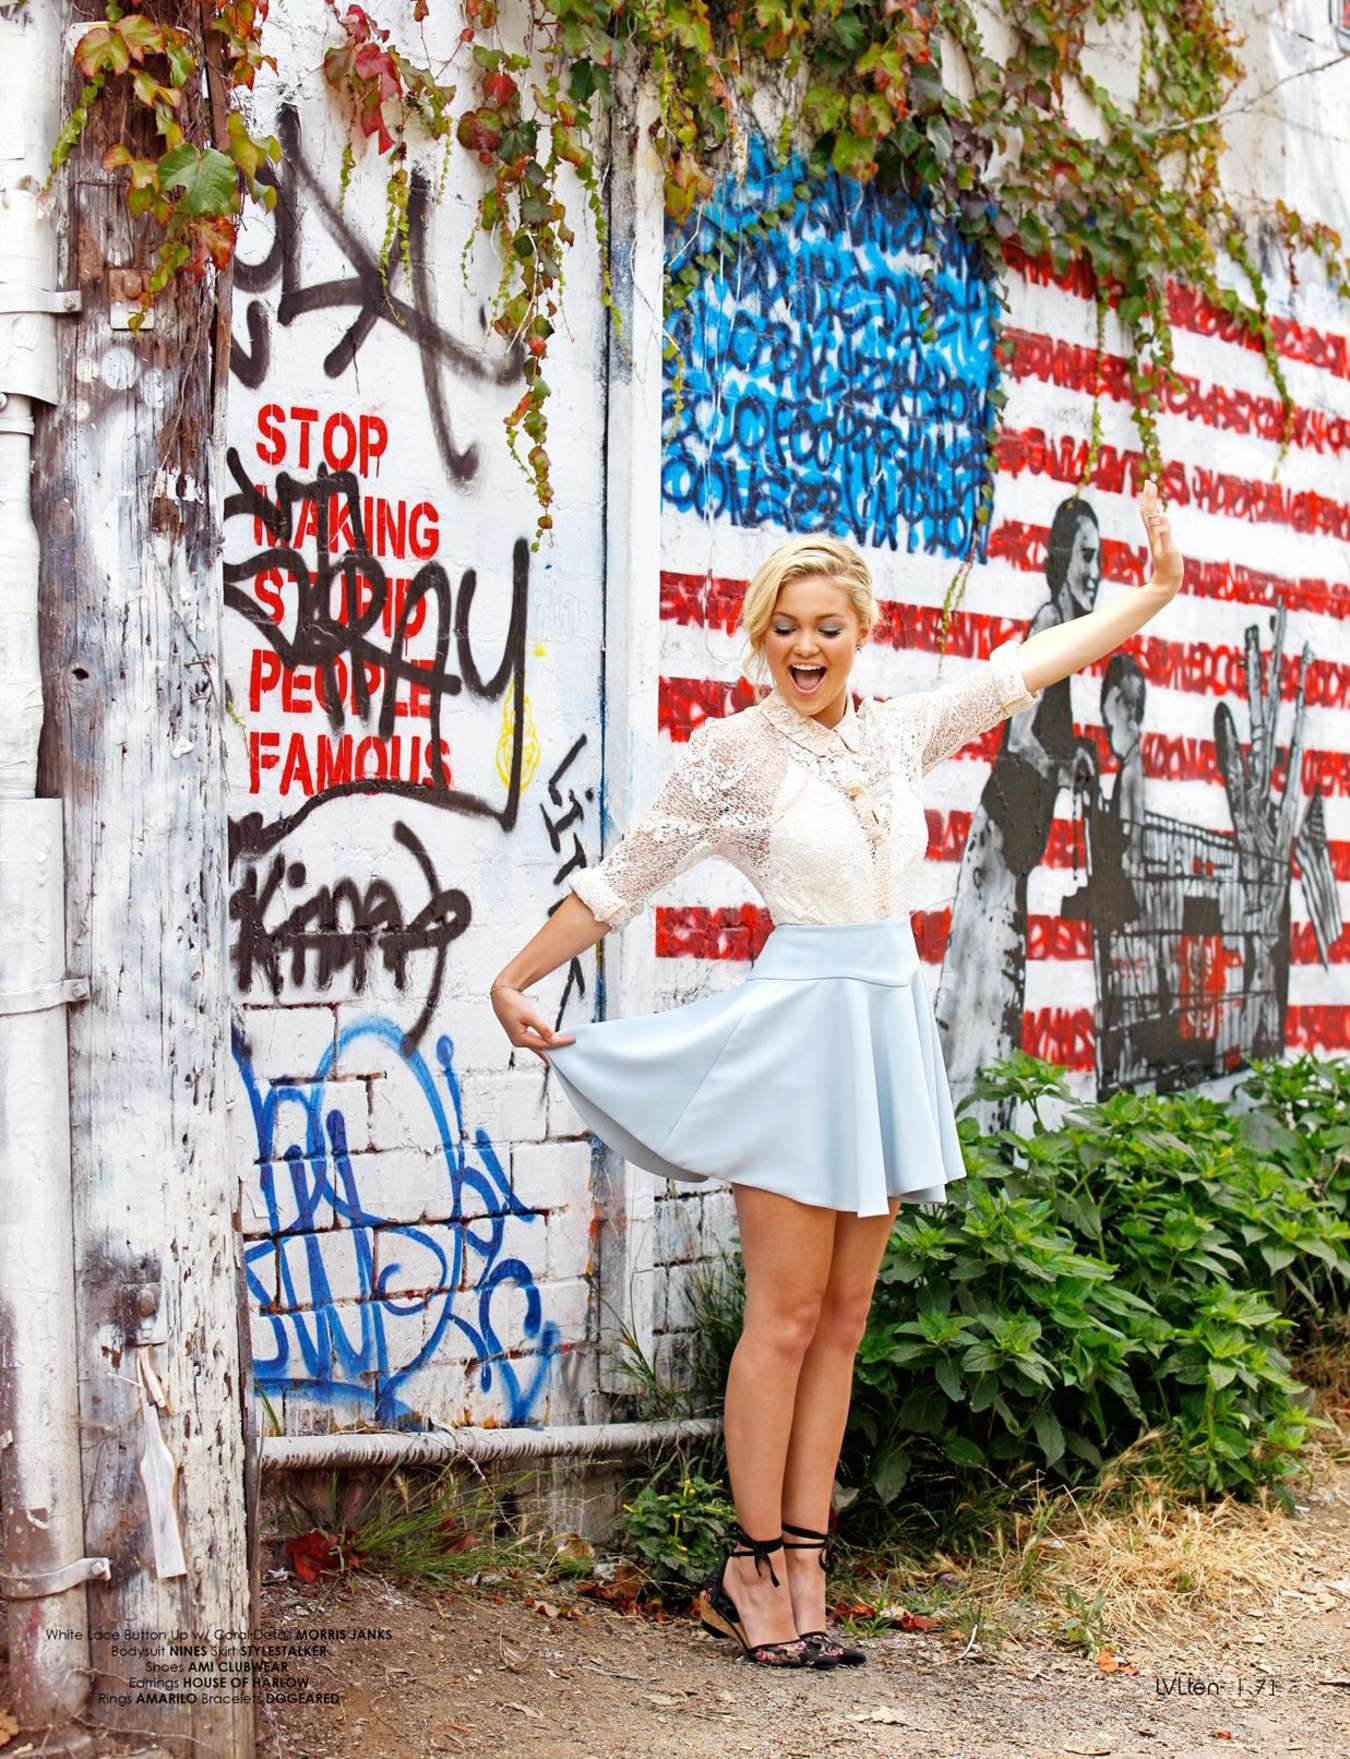 Olivia Holt 2015 : Olivia Holt: LVlten Magazine 2015 -02